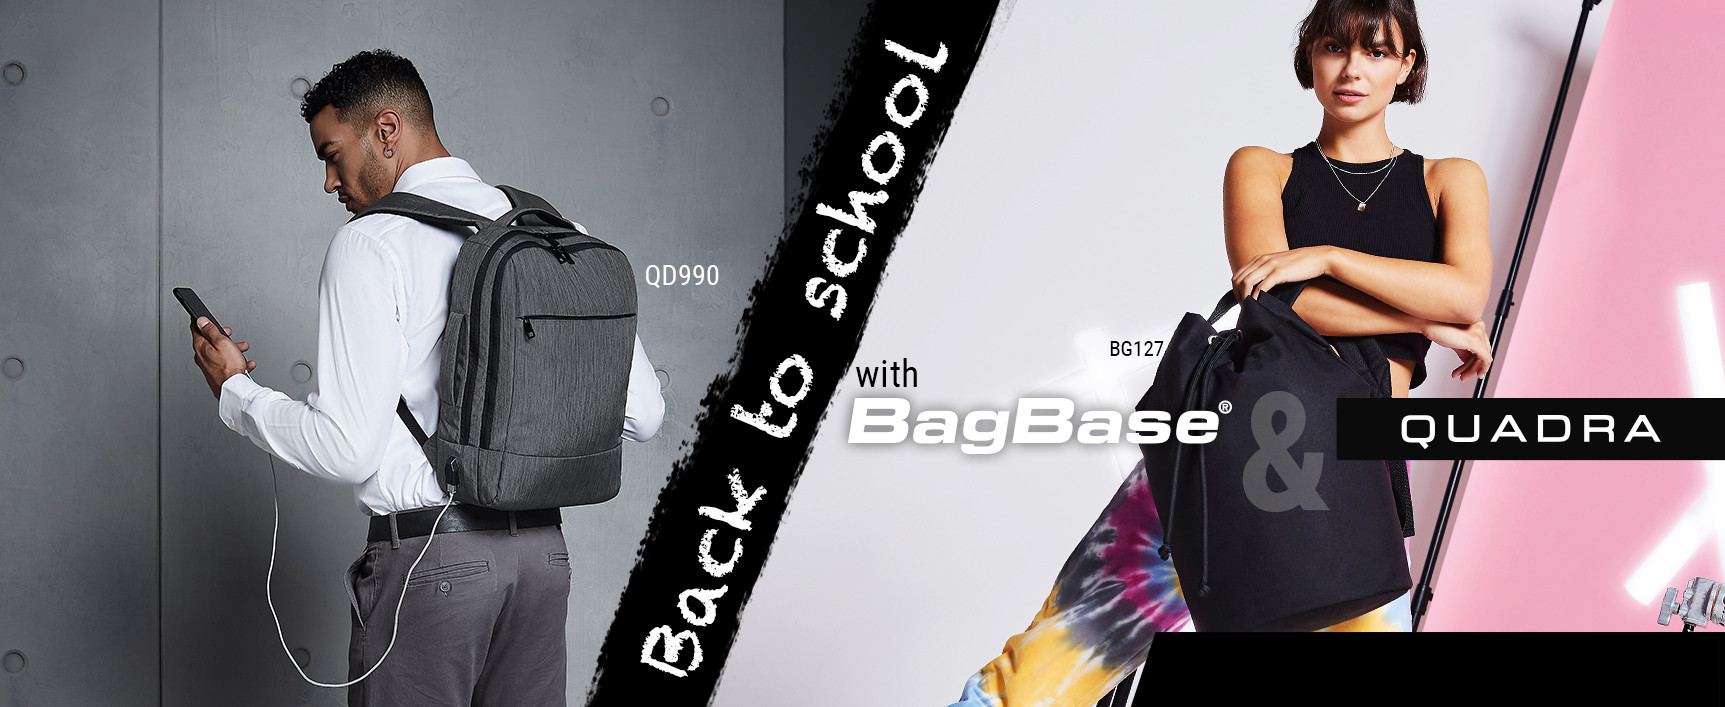 BagBase - Quadra : Back to school !